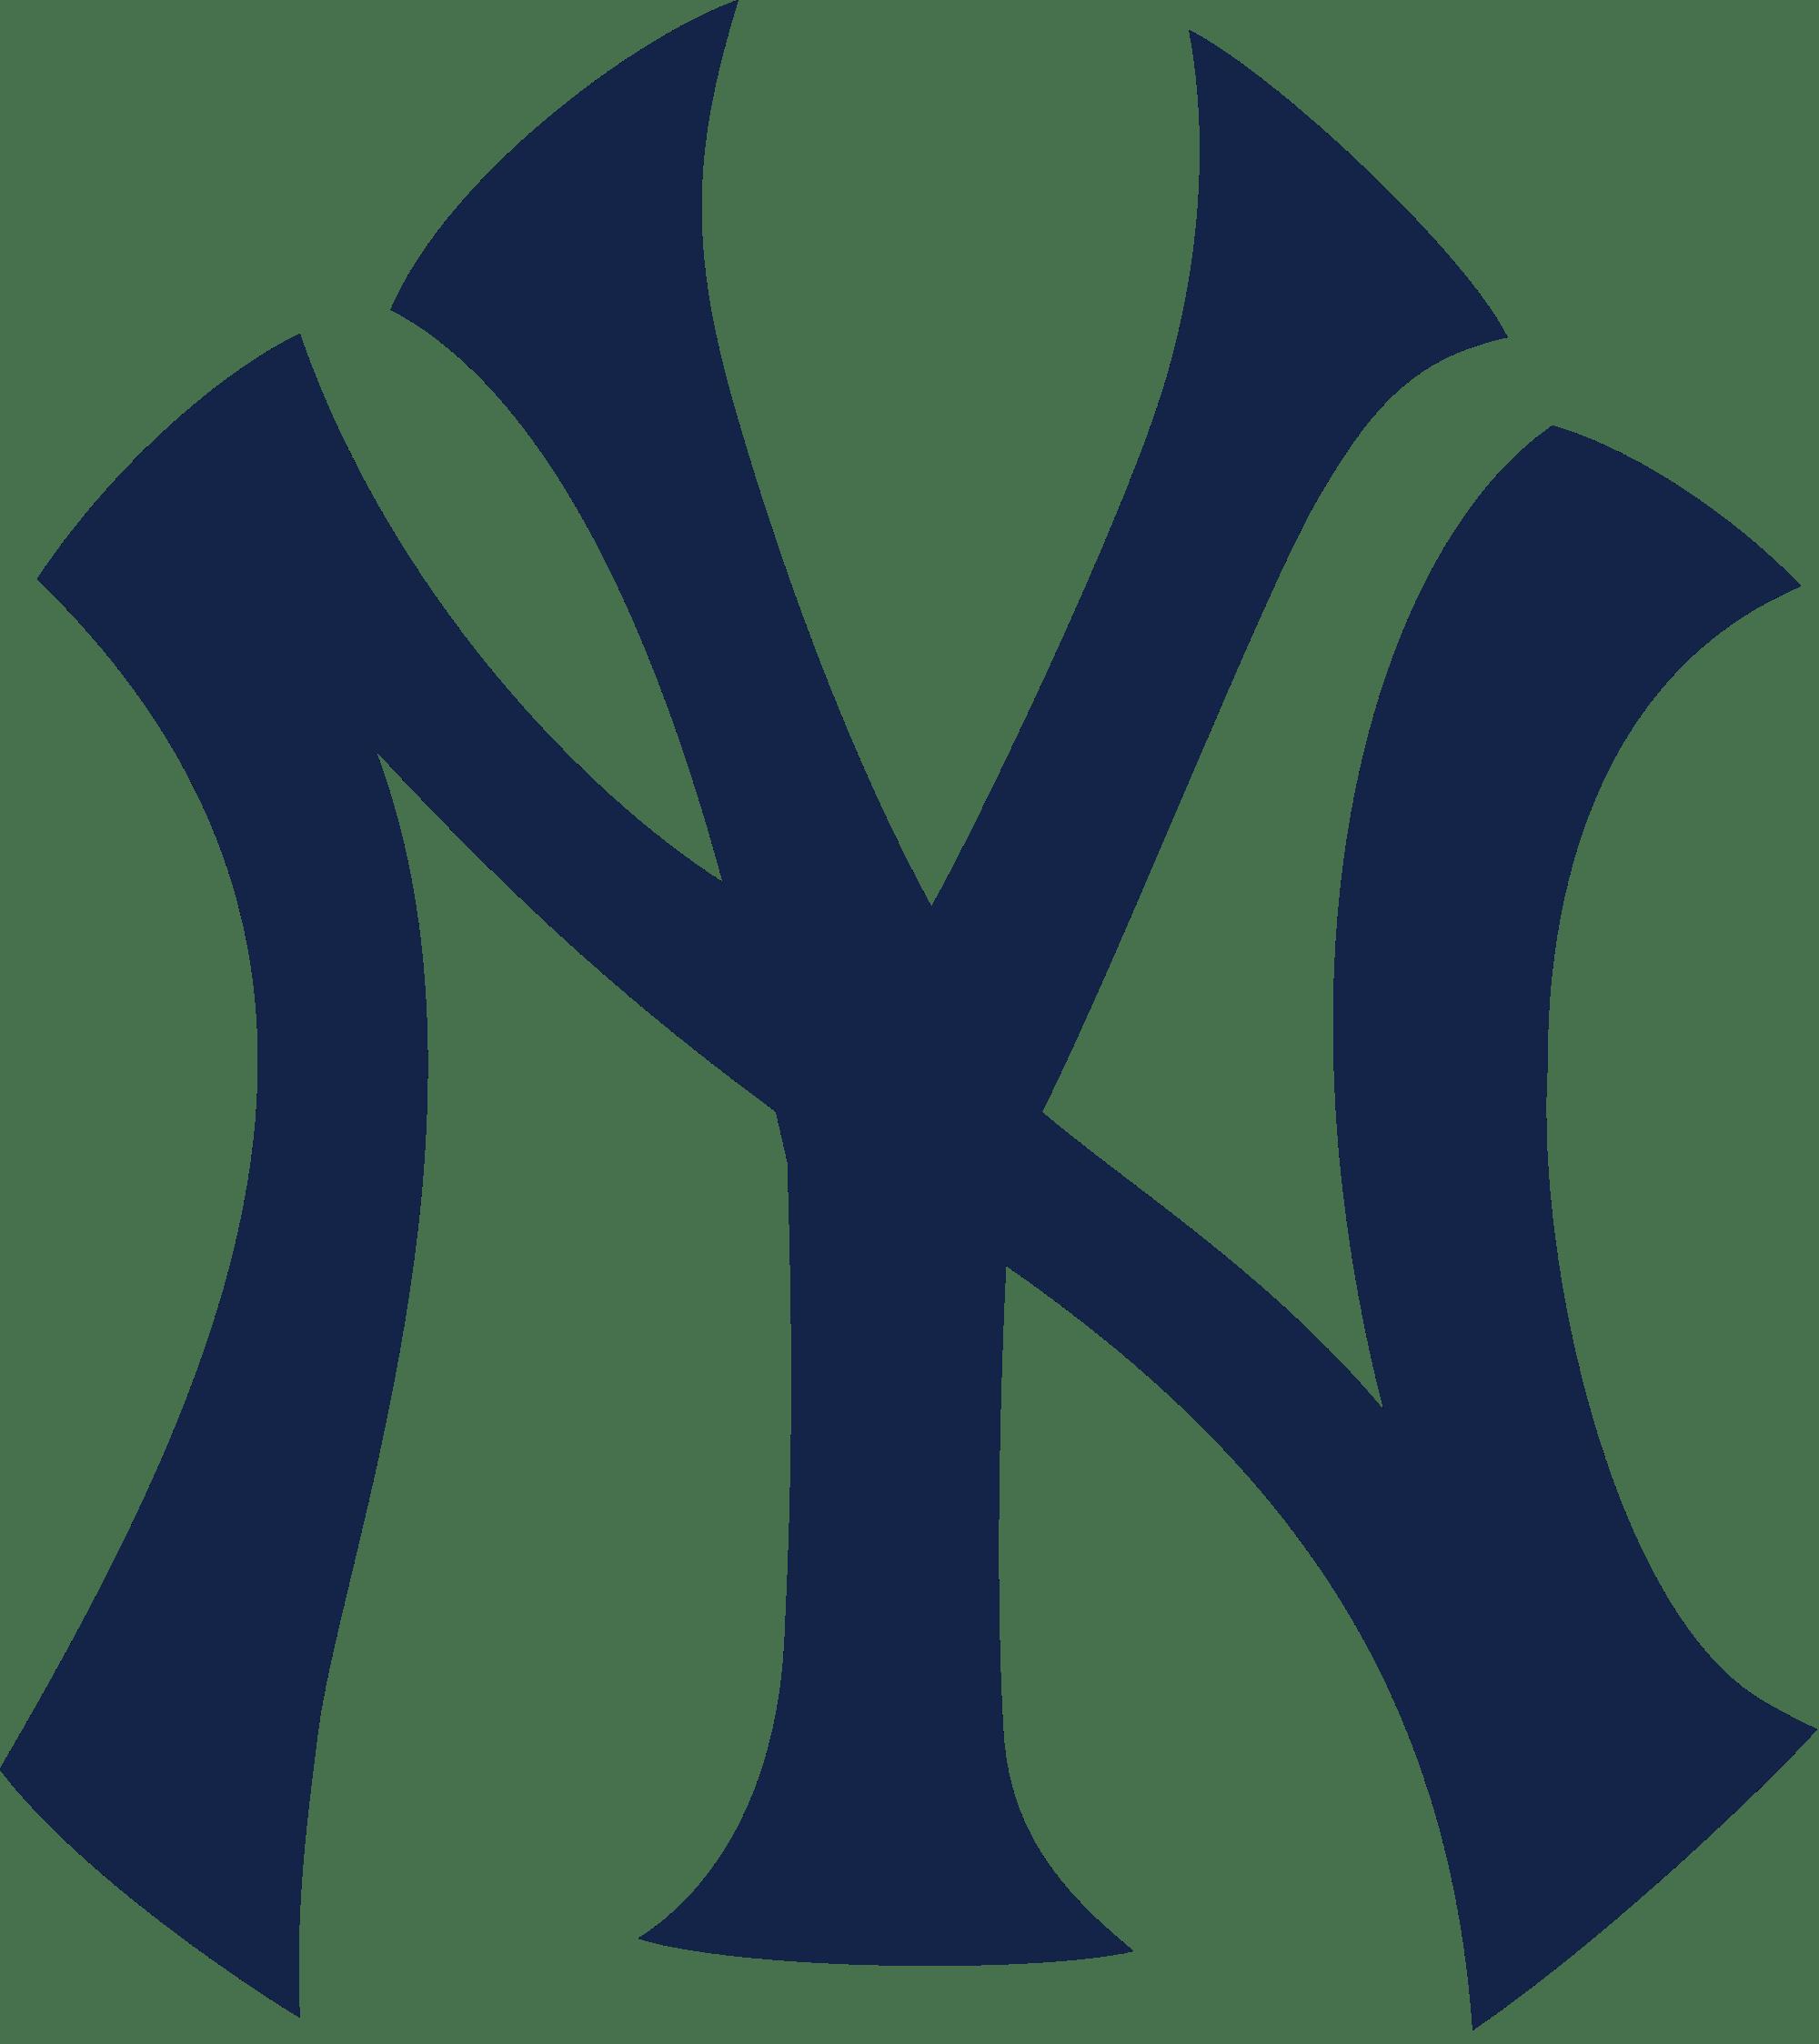 New York Yankees Logo Ny New York Yankees Logo Ny Yankees Logo Yankees Logo